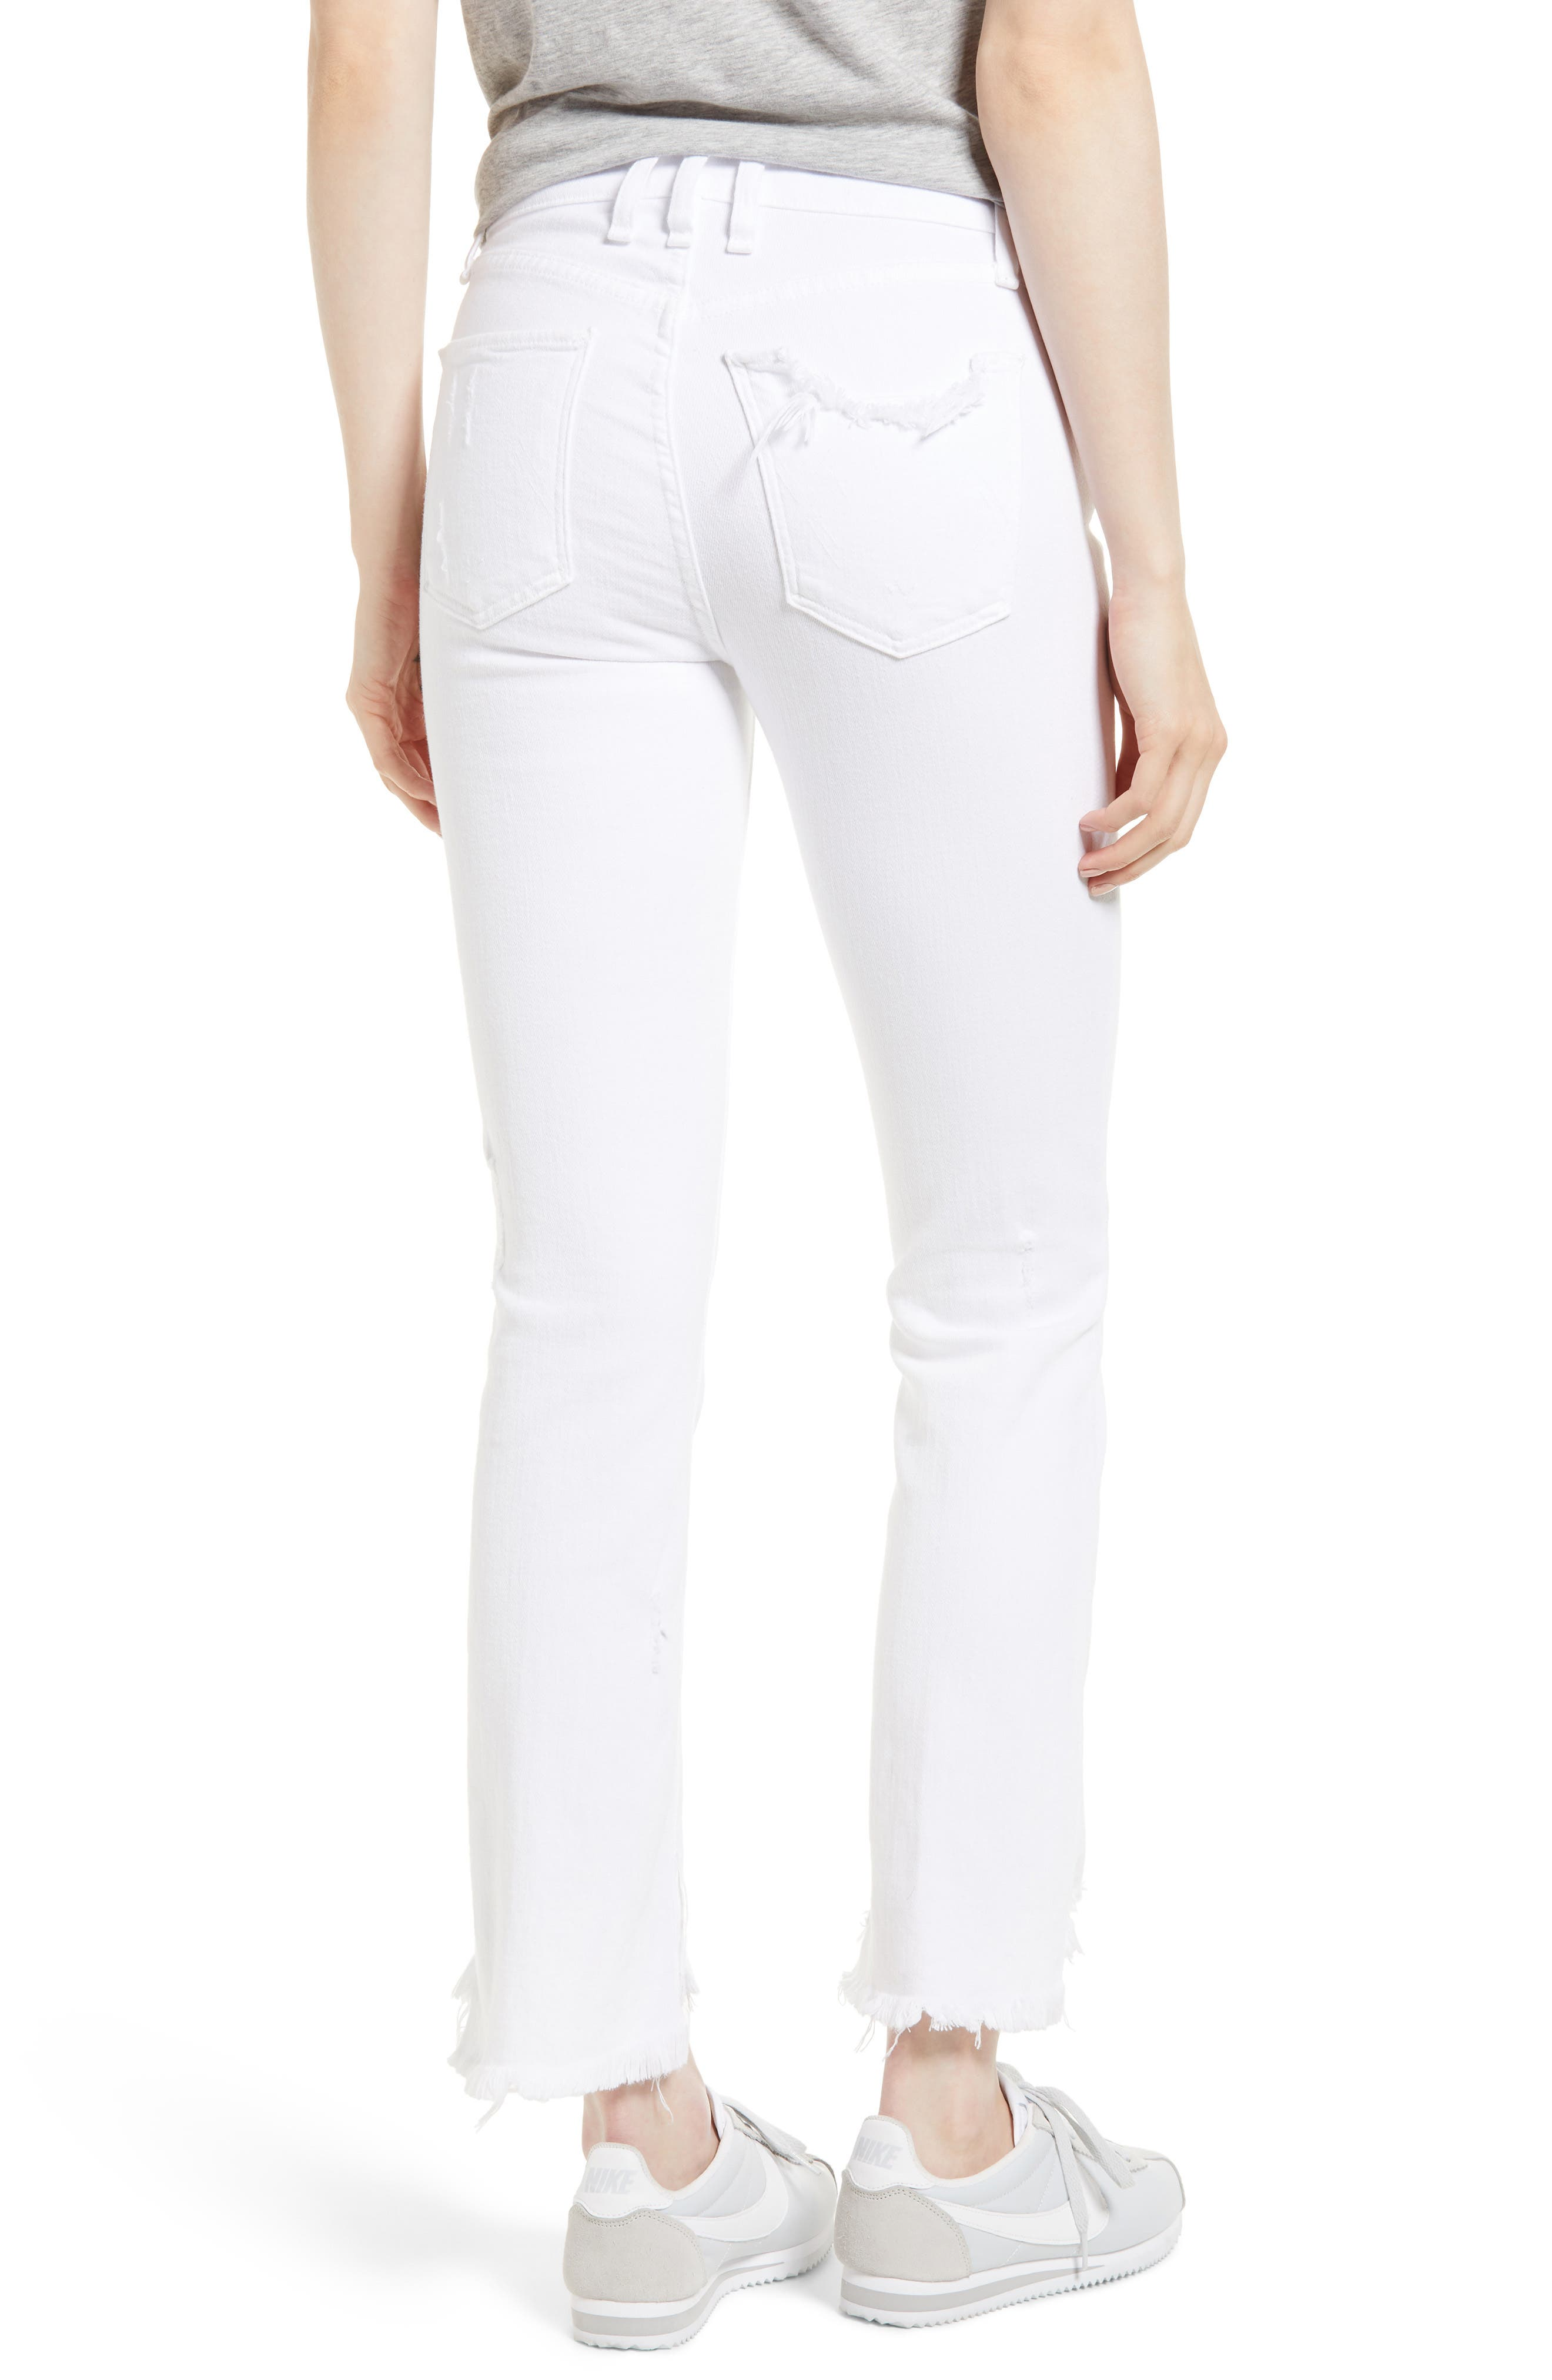 Valetta Step Hem Straight Leg Jeans,                             Alternate thumbnail 2, color,                             SIDARI